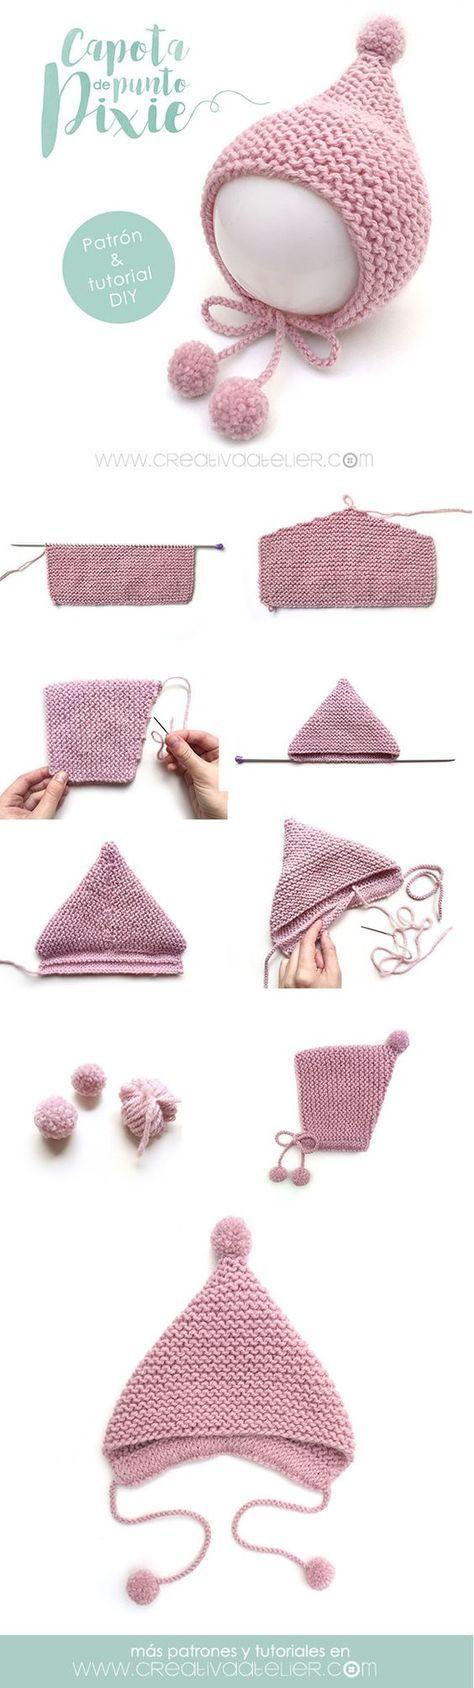 Pixie baby hat | | crochet | Pinterest | Duendes, Tejido y Bebé